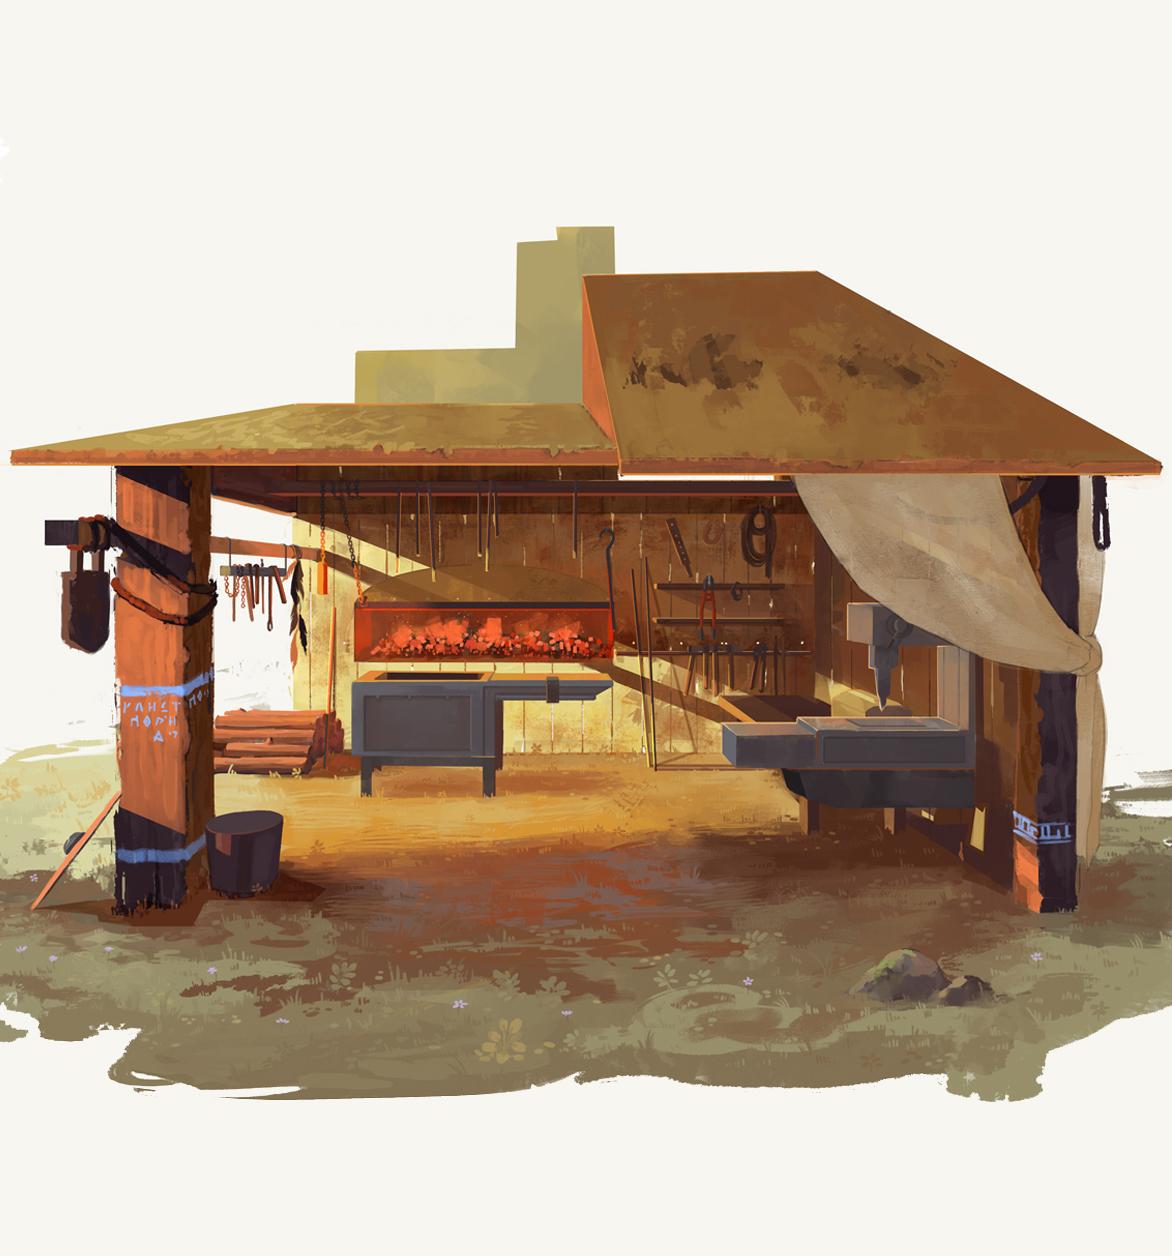 Concept art de una forja en Kluest